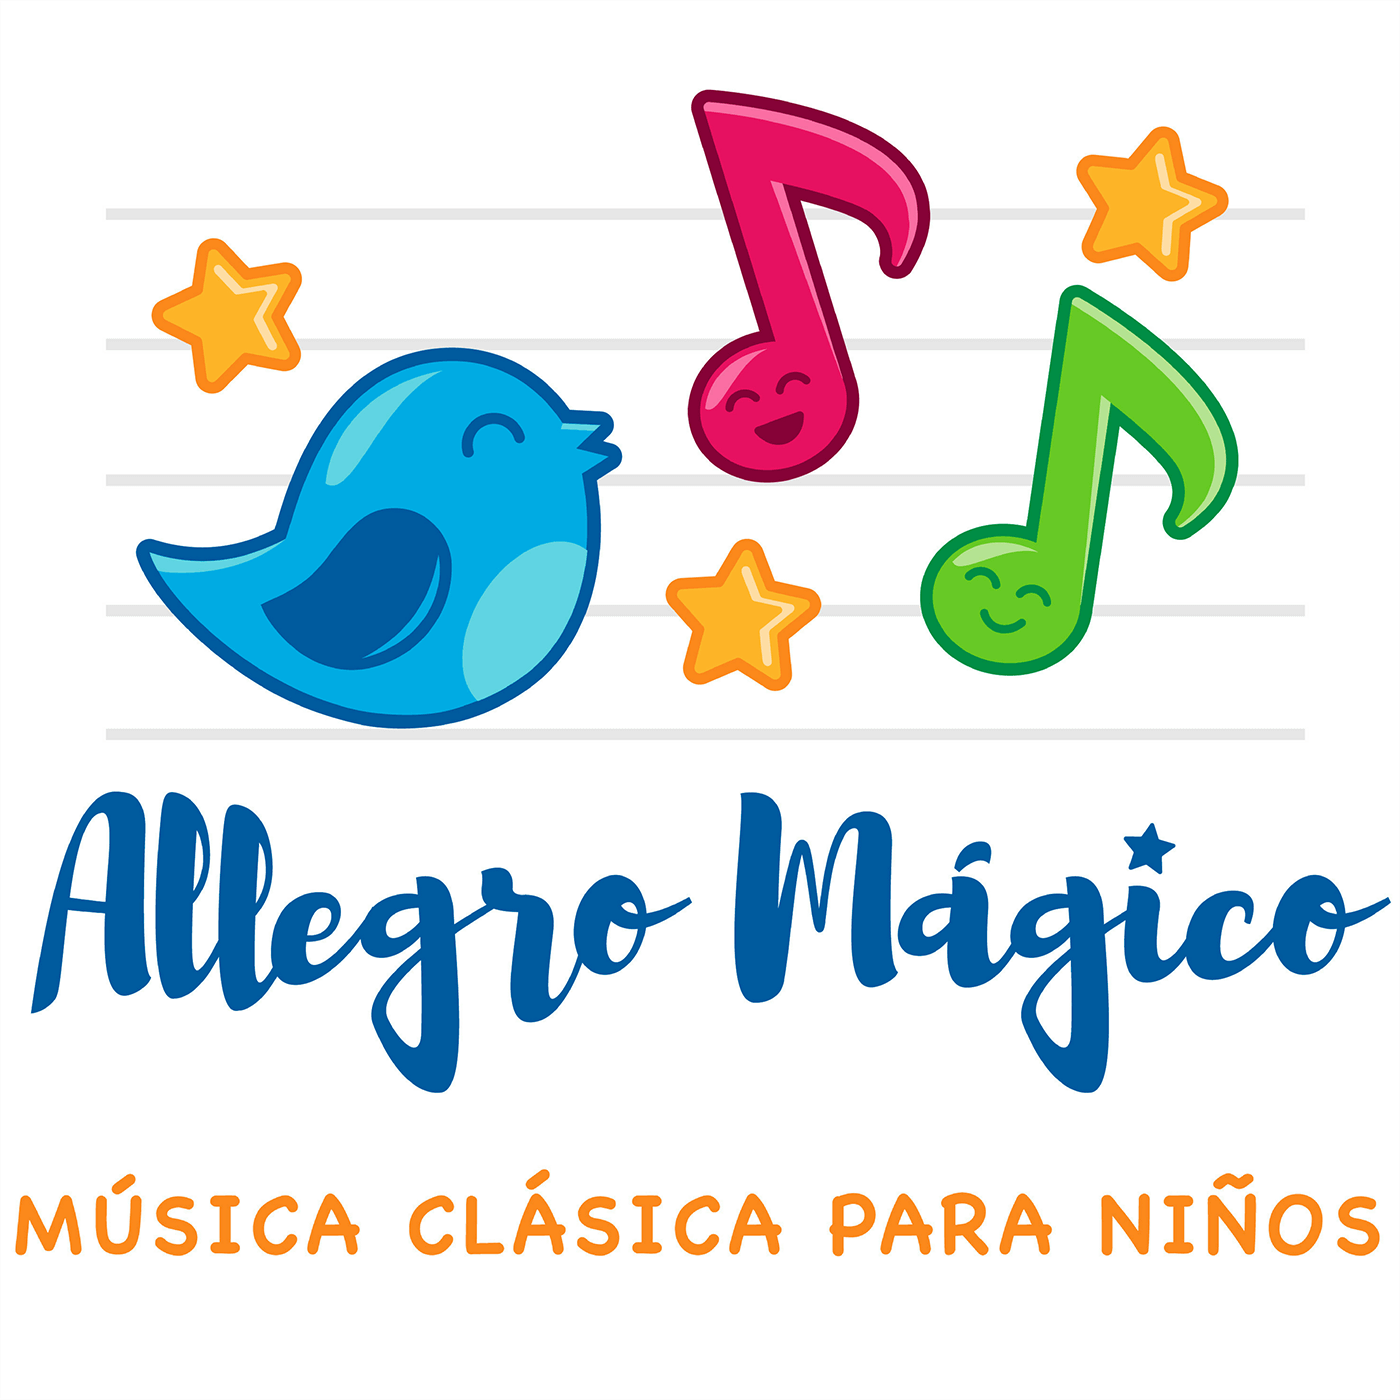 Allegro Mágico, Música clásica para niños show art